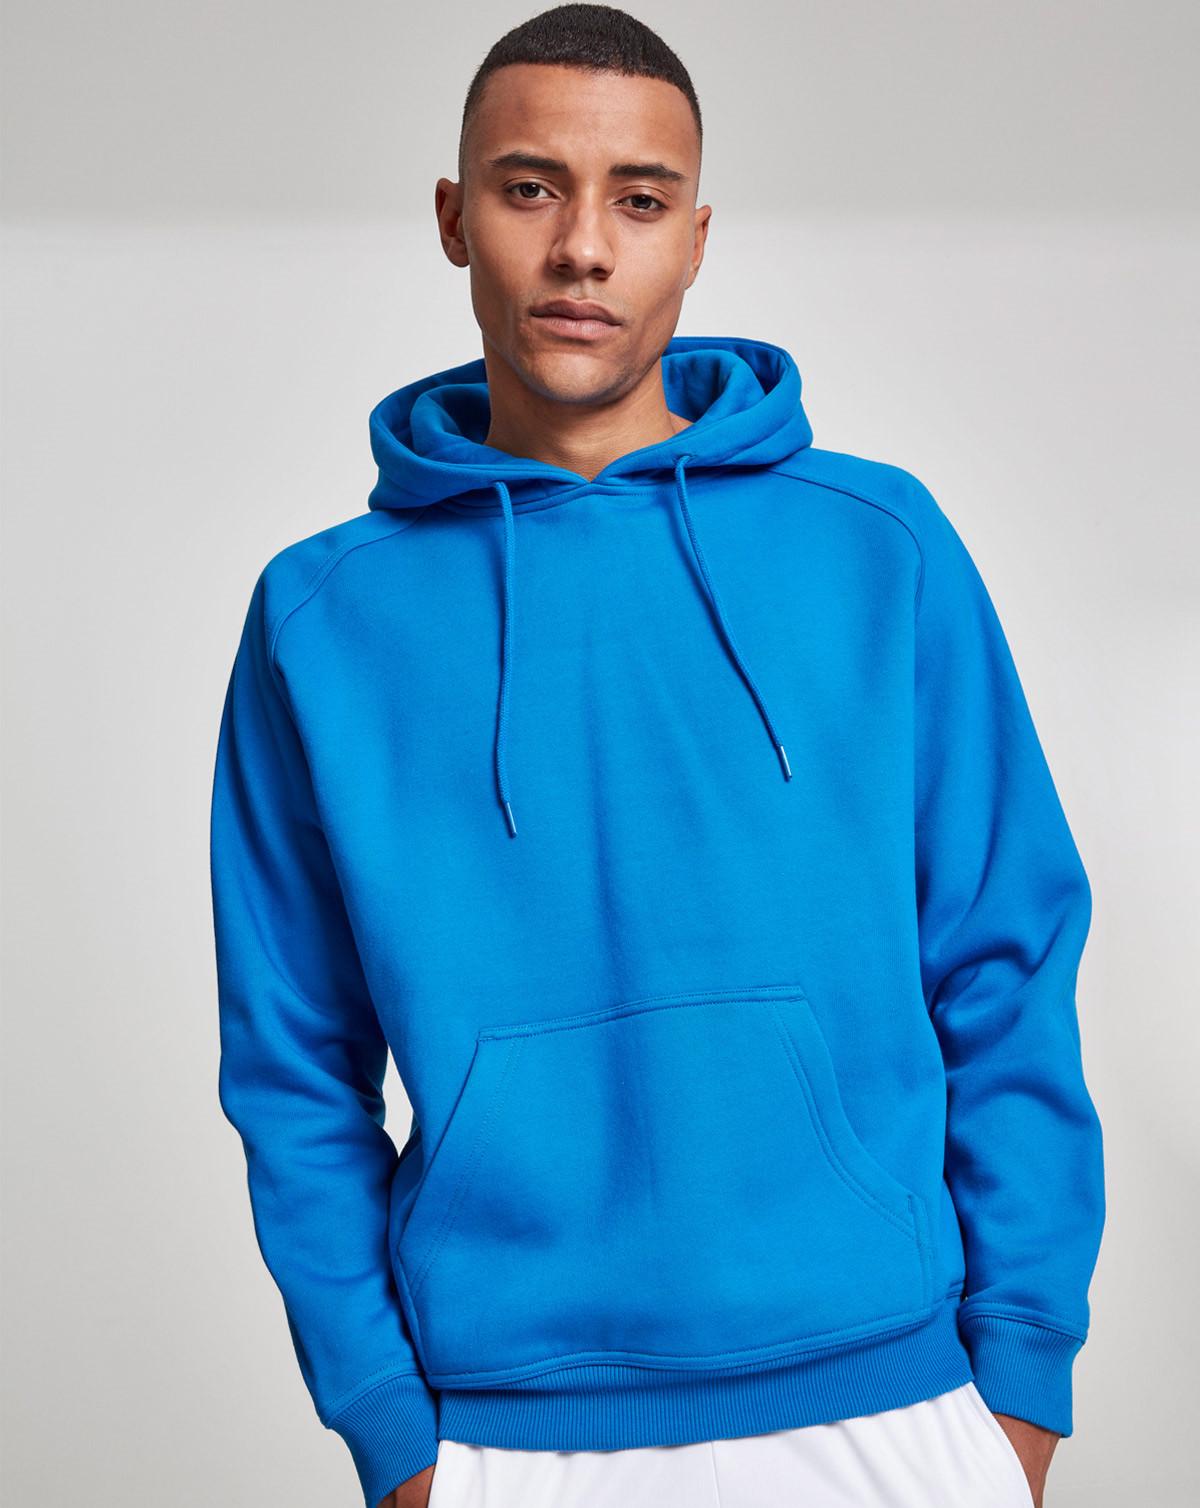 Urban Classics Blank Hoody (Cobalt Blue, 2XL)